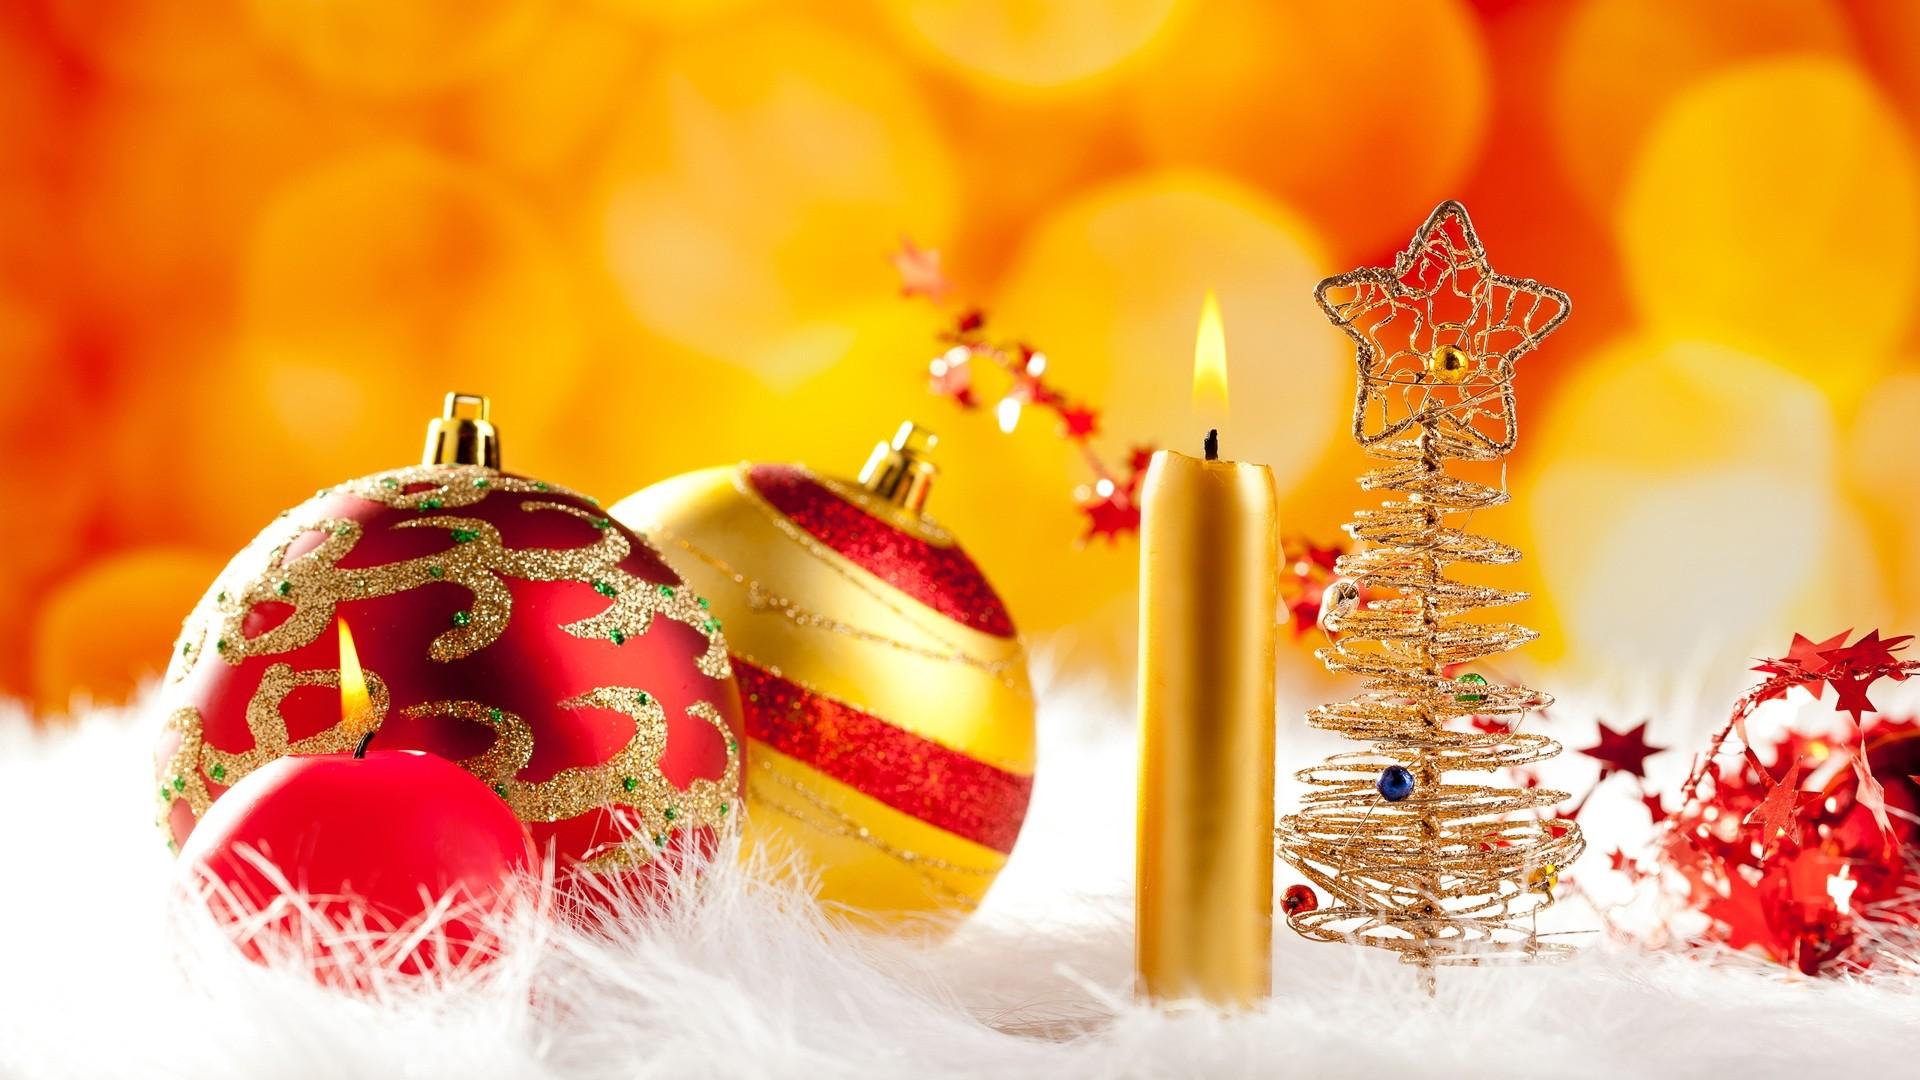 40 Free Christmas Wallpapers HD Quality | 2012 Collection | Epic Car  Wallpapers | Pinterest | Wallpaper, Free christmas wallpaper and Wallpaper  art